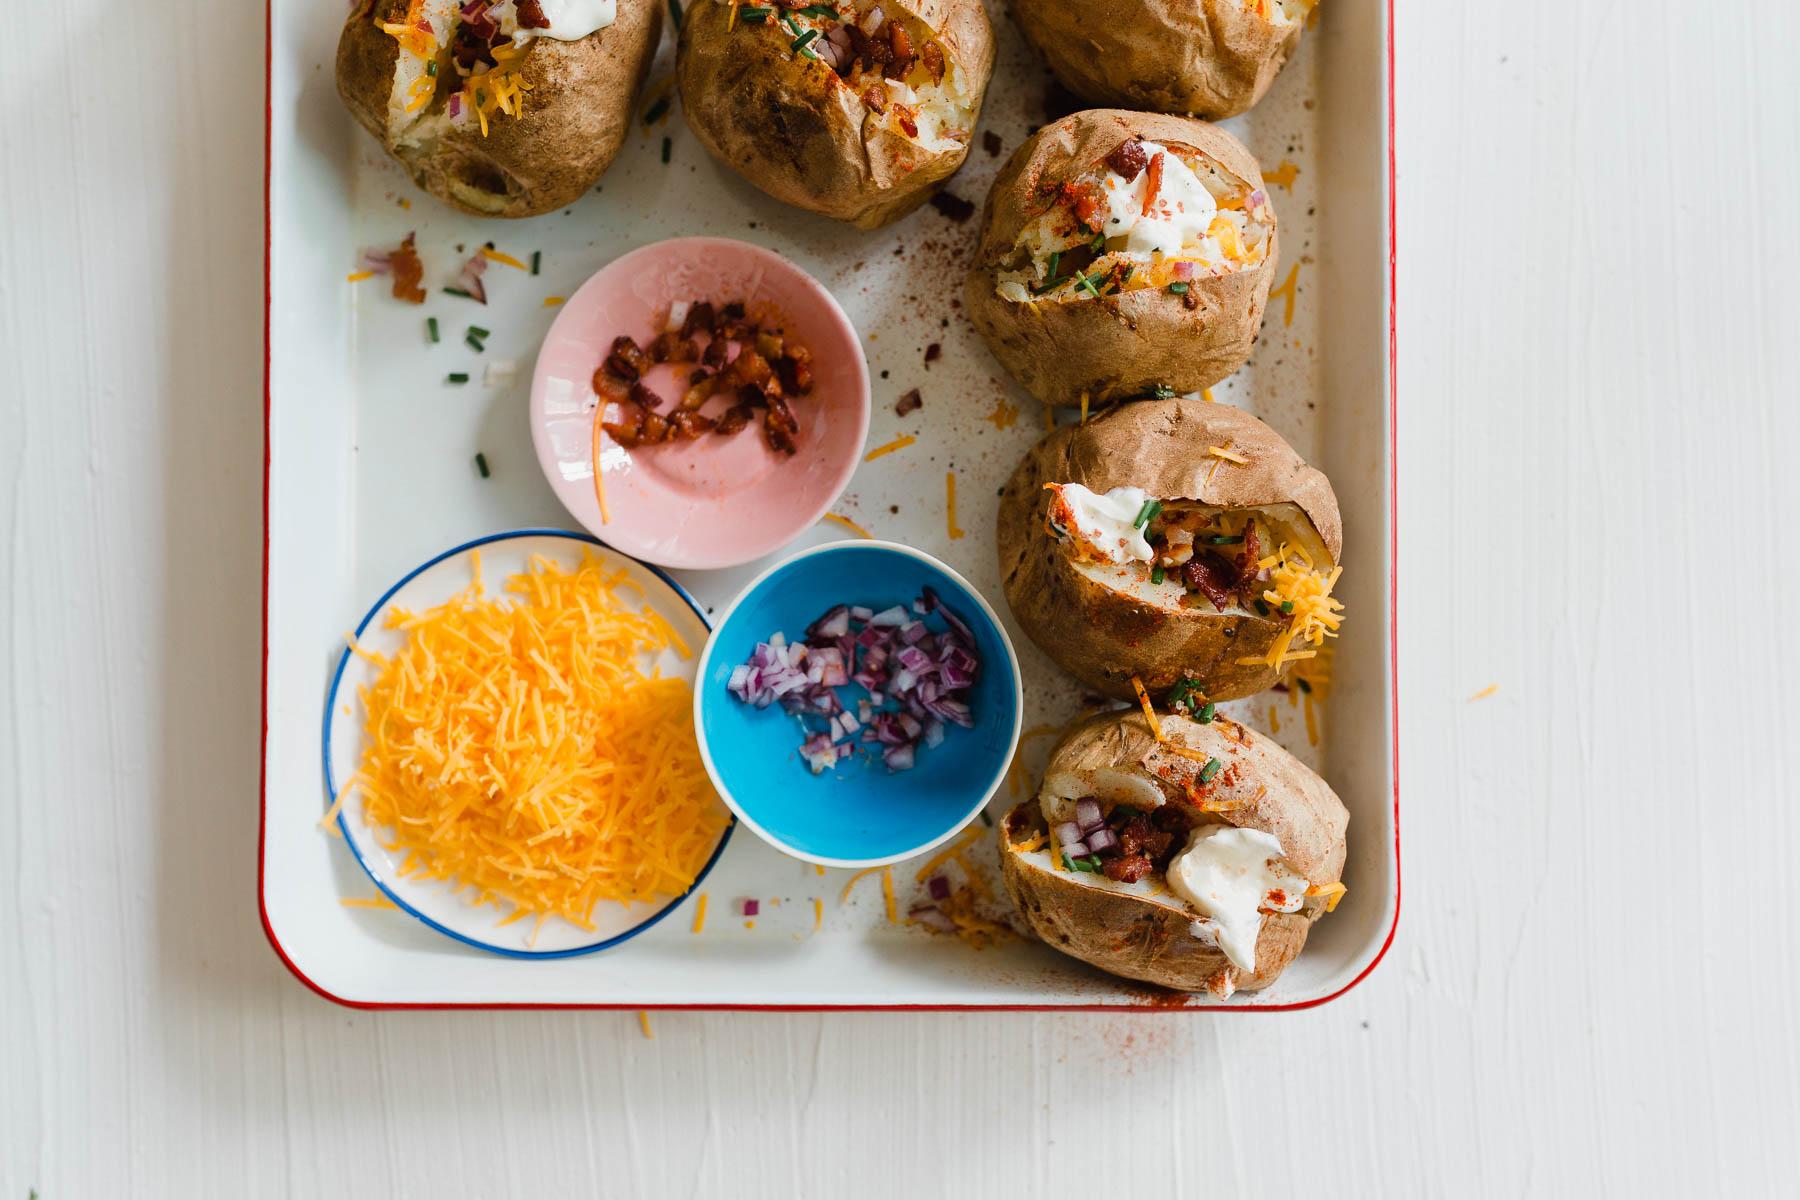 chicago-nyc-food-lifestyle-photographer-10.jpg